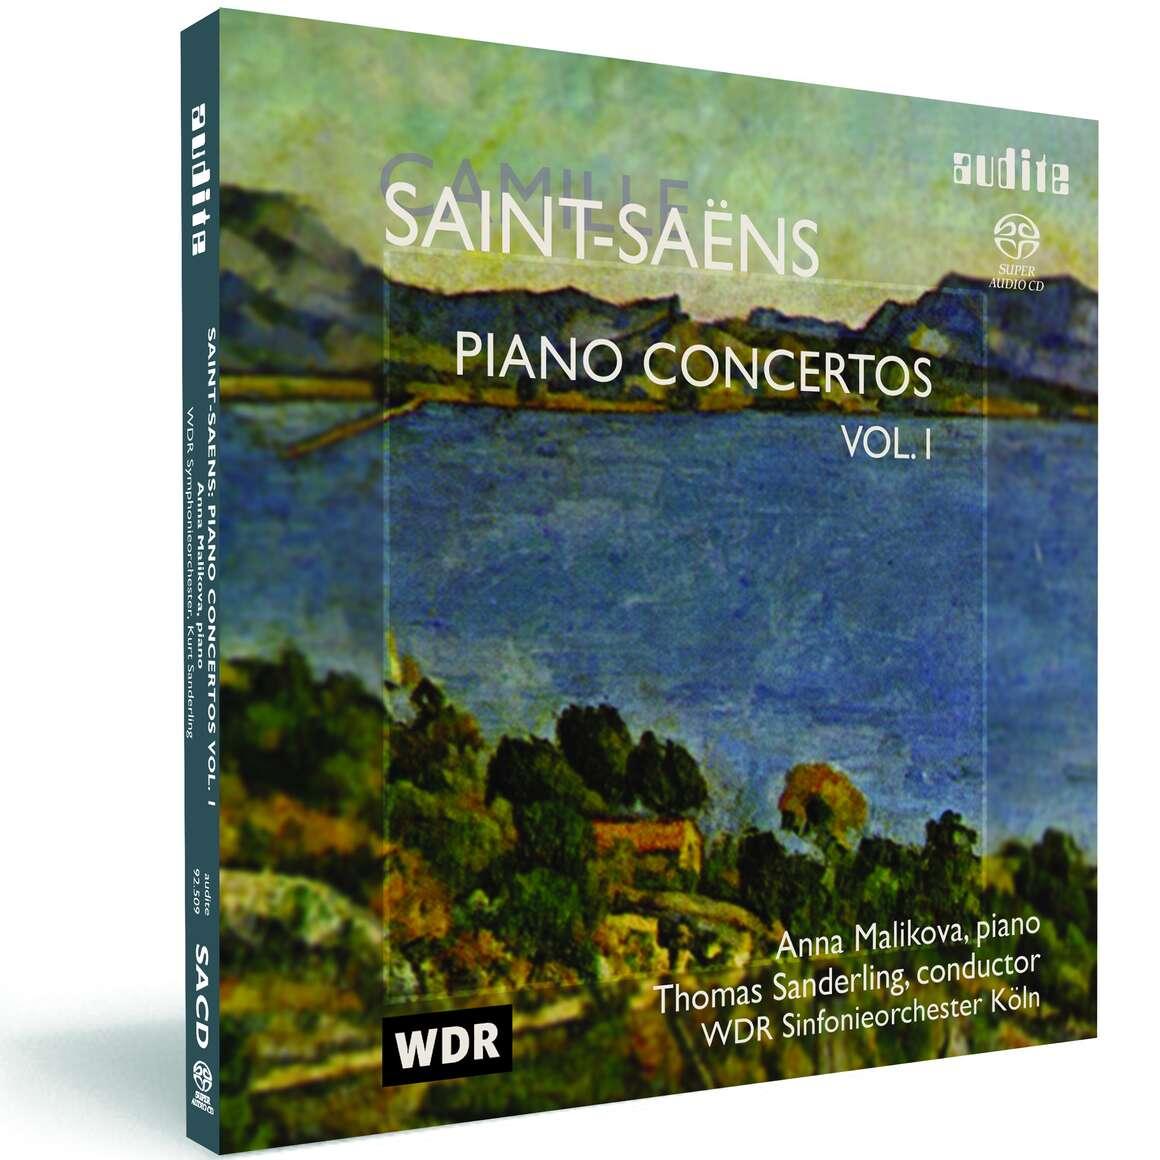 C. Saint-Saëns: Piano Concertos Vol. I